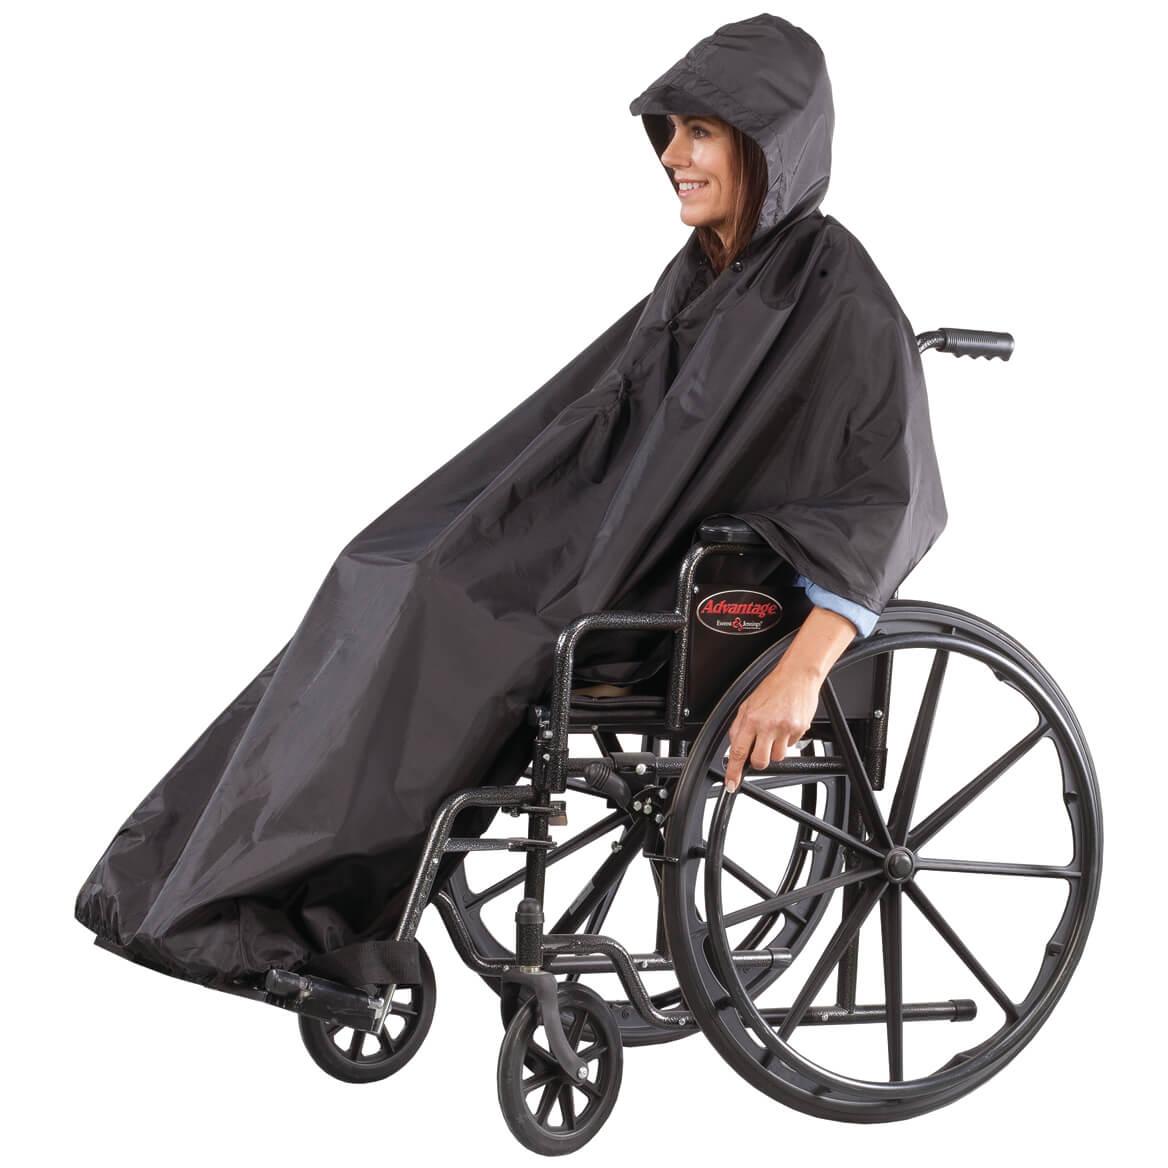 wheelchair drake casters for chairs on carpet rain poncho rainwear